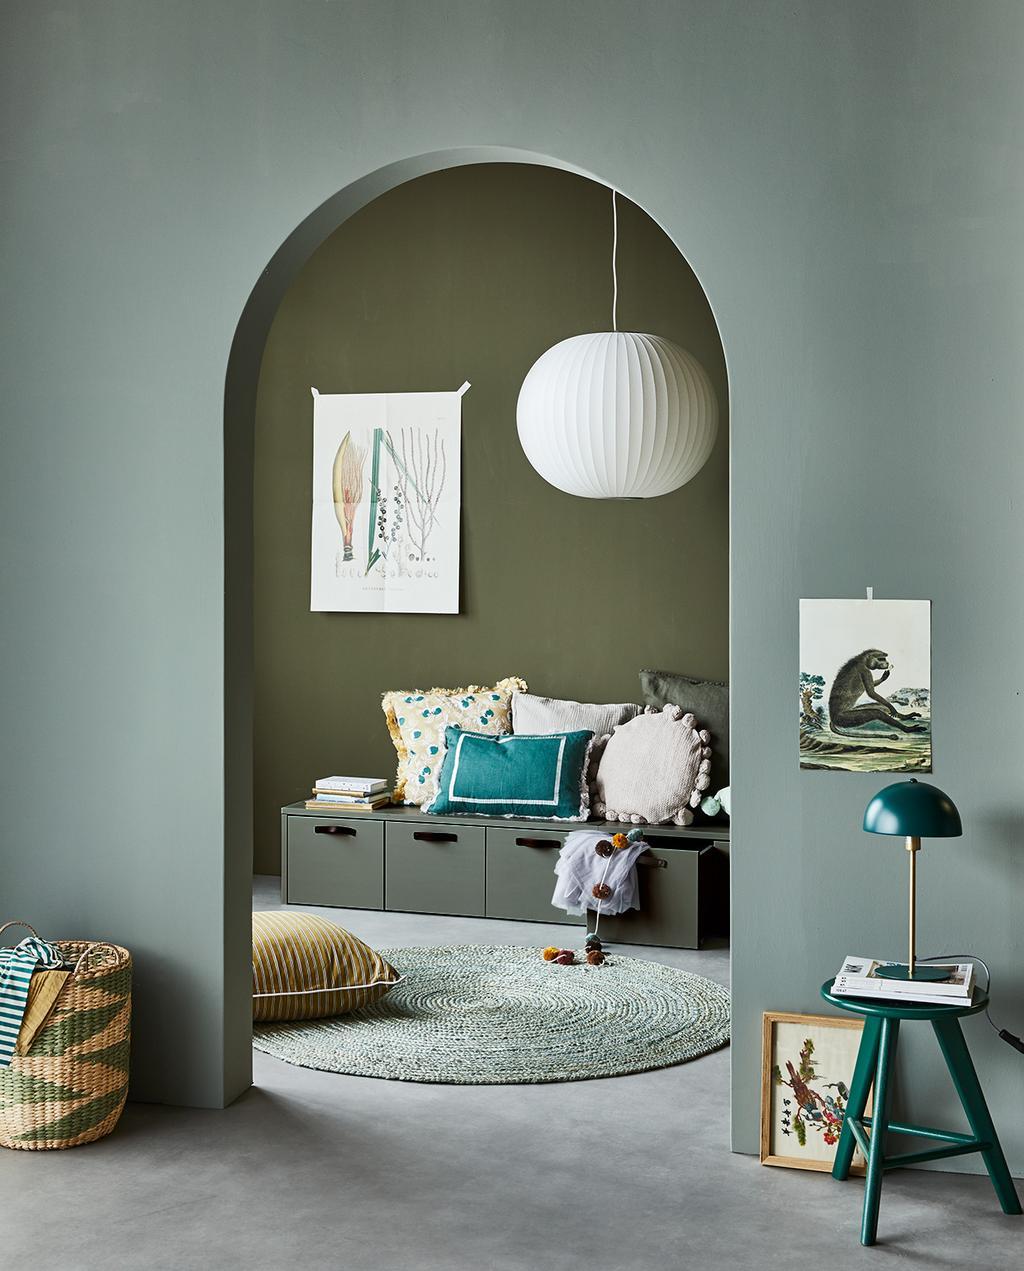 vtwonen 04-2021 | vtwonen collectie verf groene muur kleur camouflage en soap